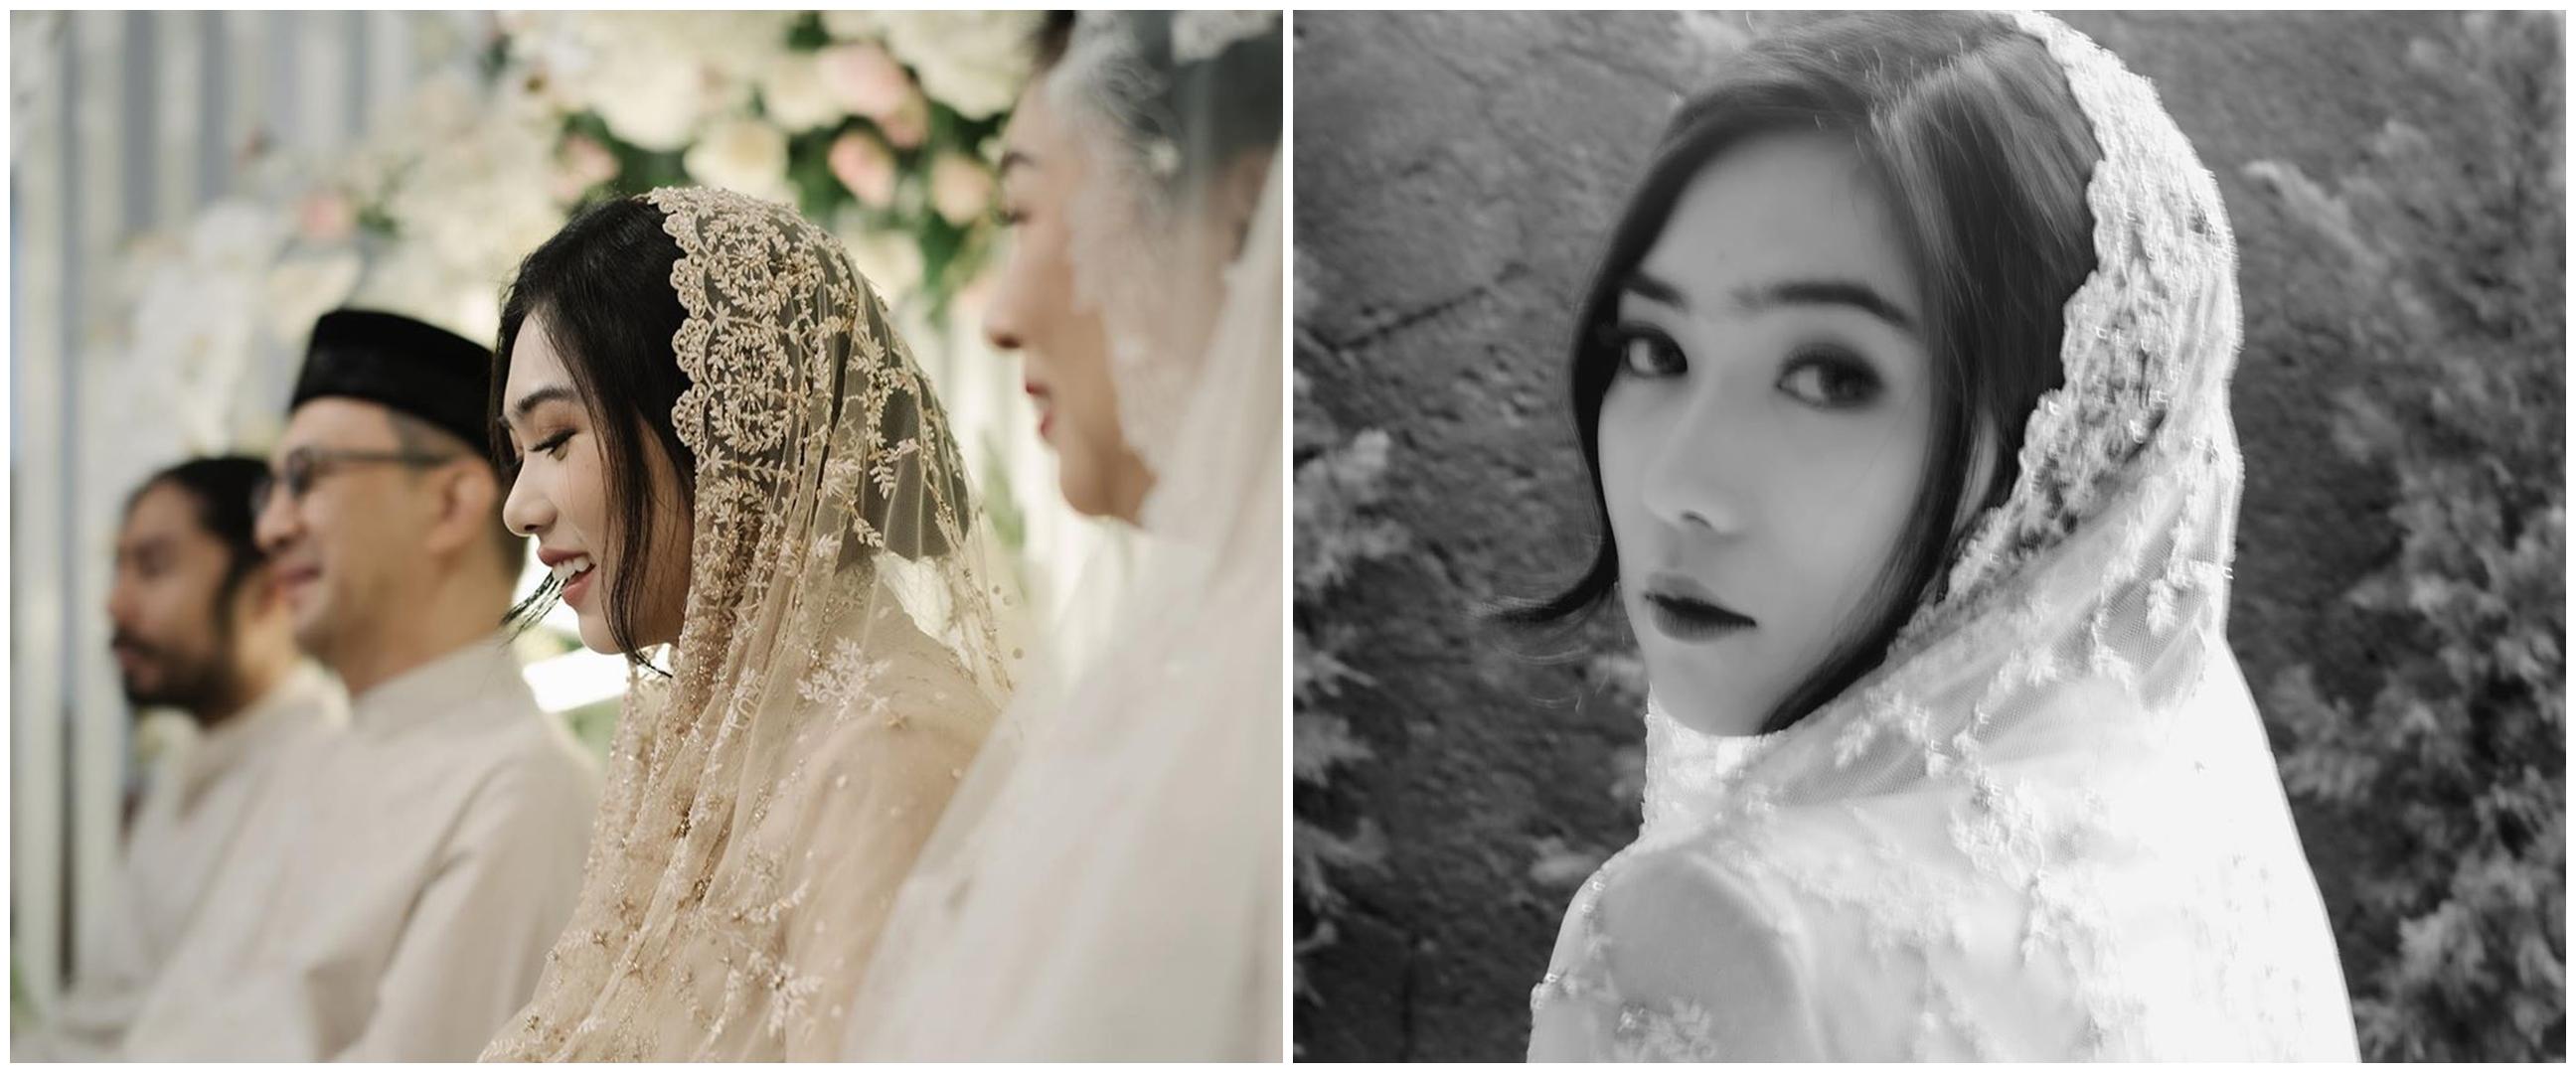 Jelang menikah, ini 9 momen pengajian Isyana dan Rayhan